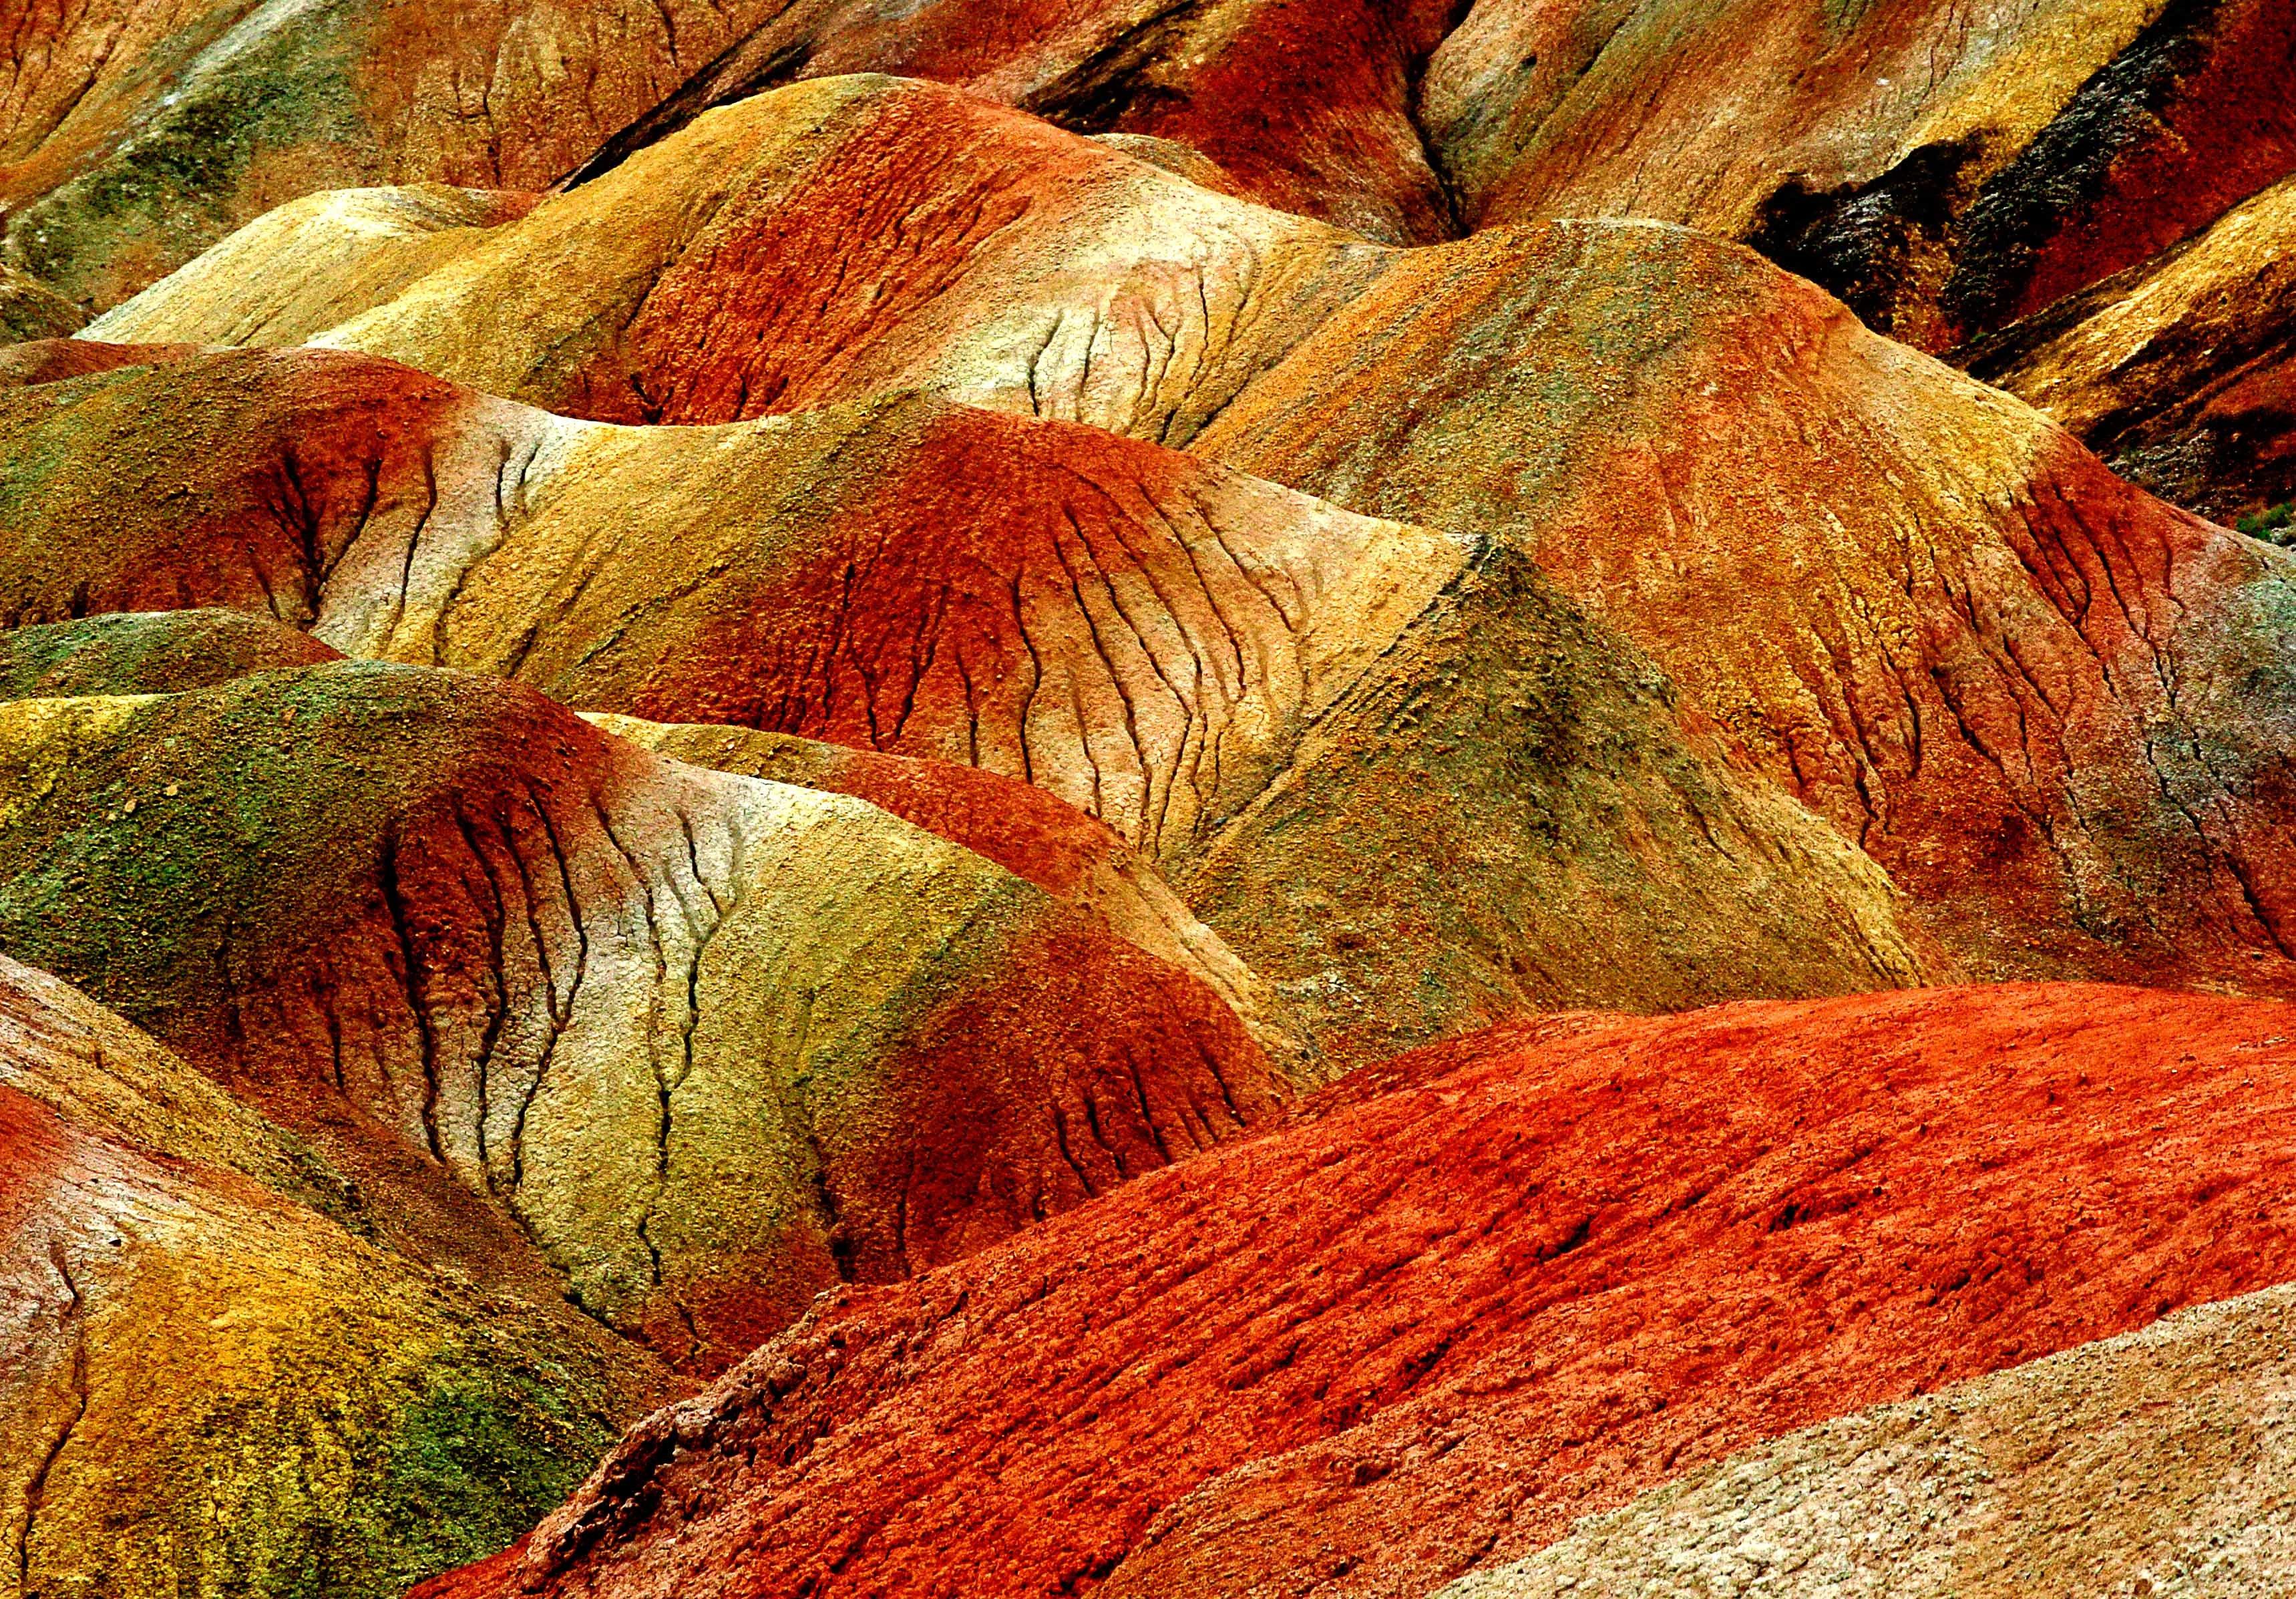 The scenery at Zhangye Danxia Landform Geological Park in Zhangye City, Gansu Province, northwest China, July 7, 2014.